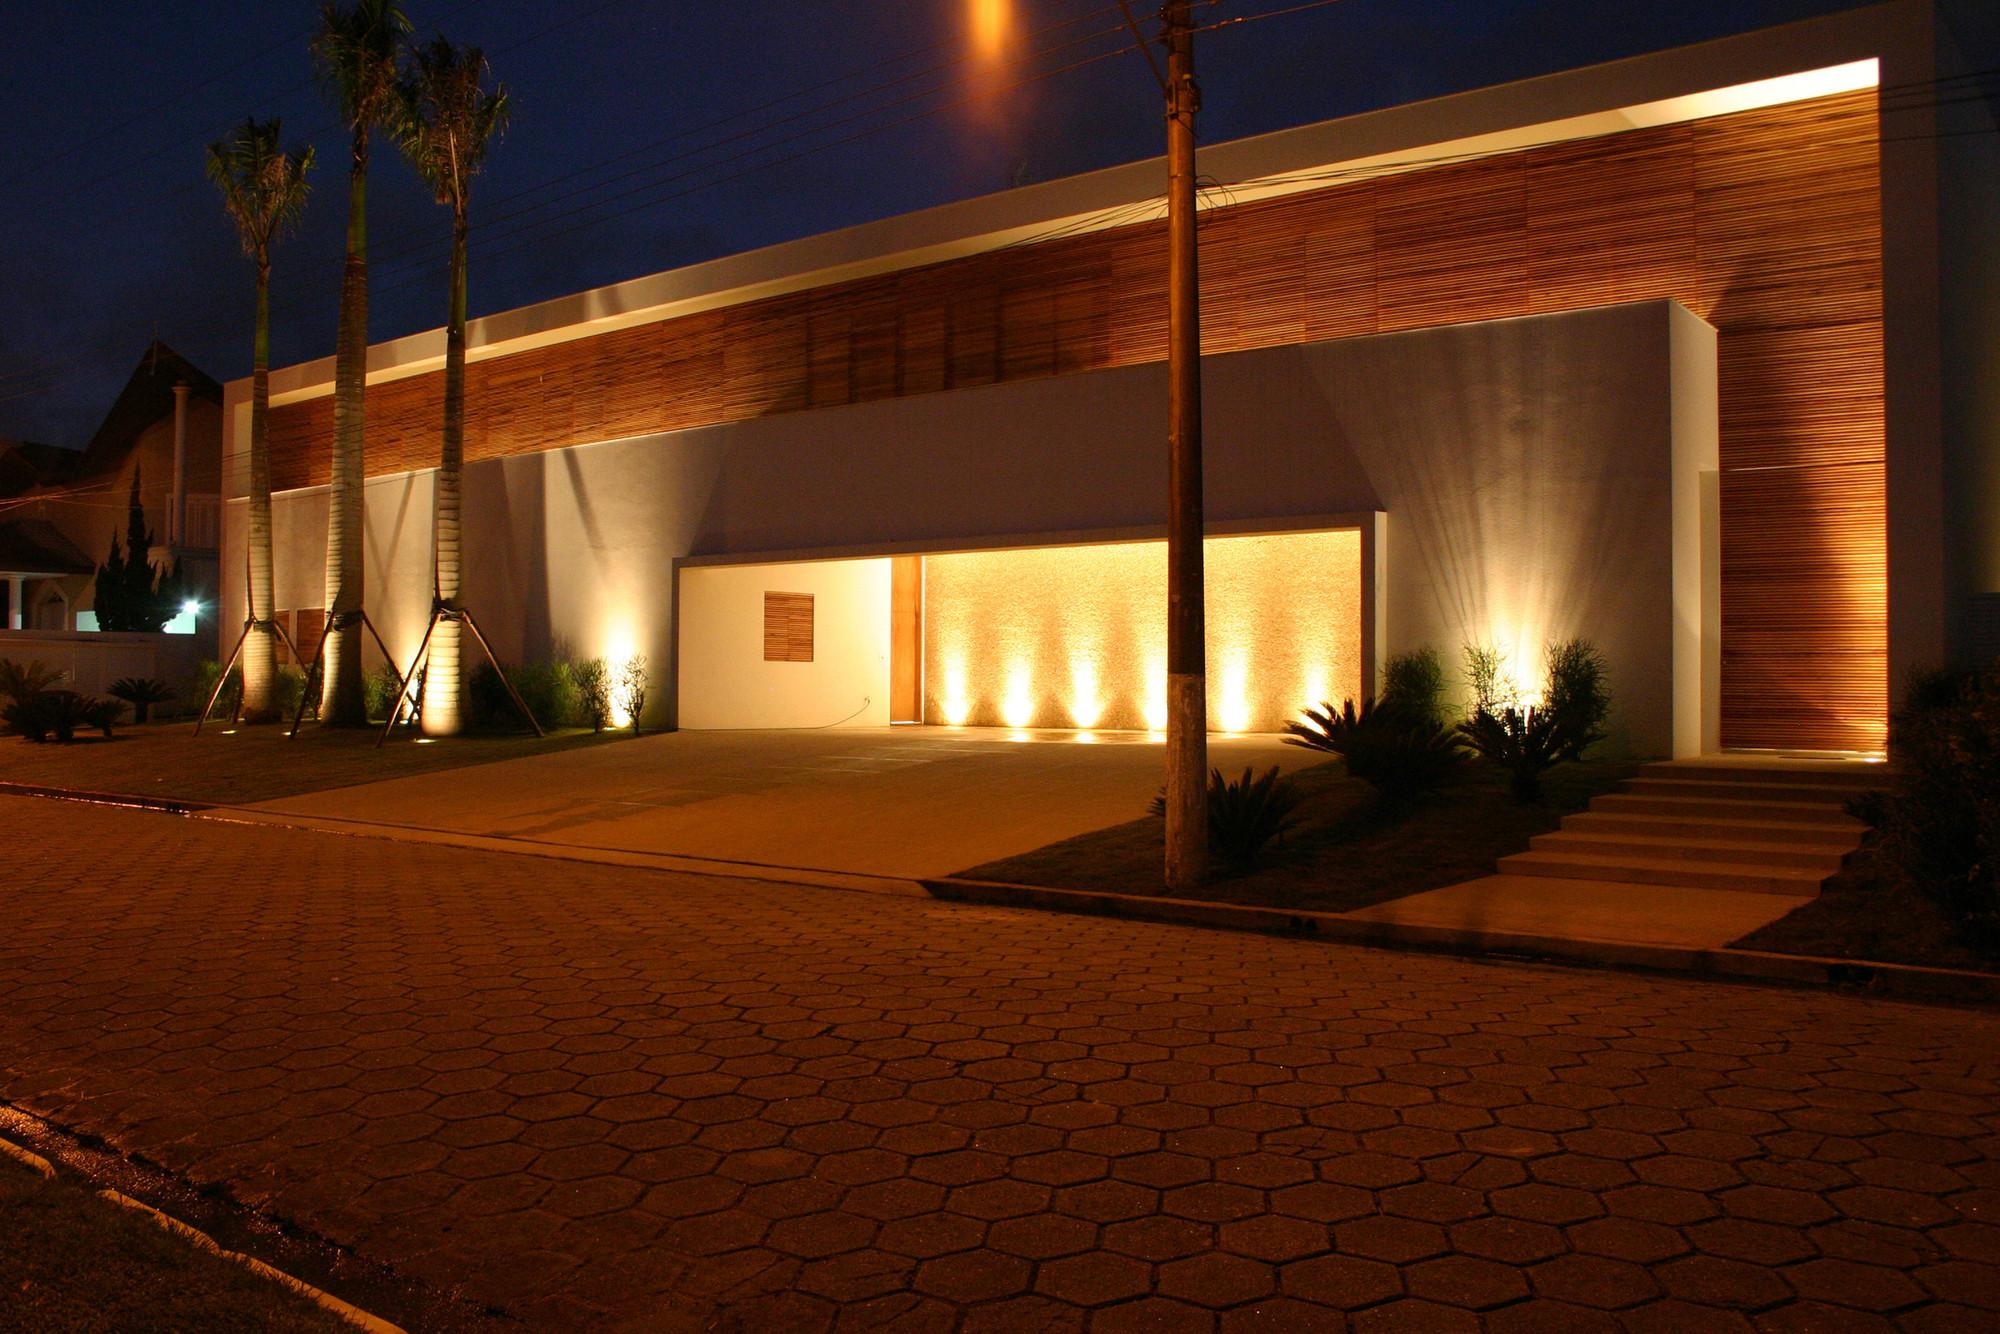 Casa MG / Basiches Arquitetos Associados